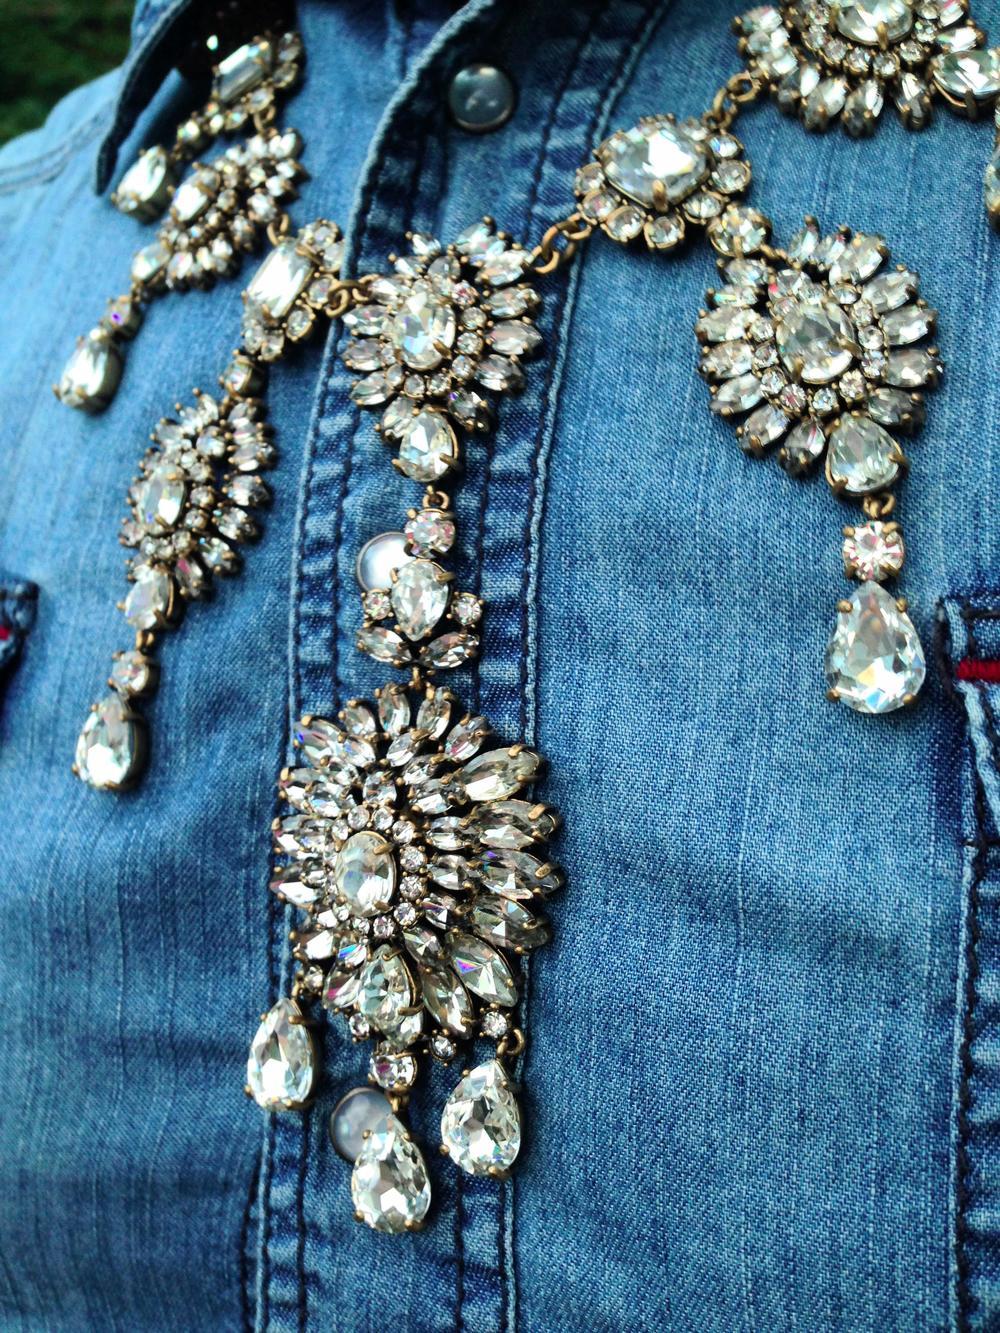 j crew necklace close up.jpg